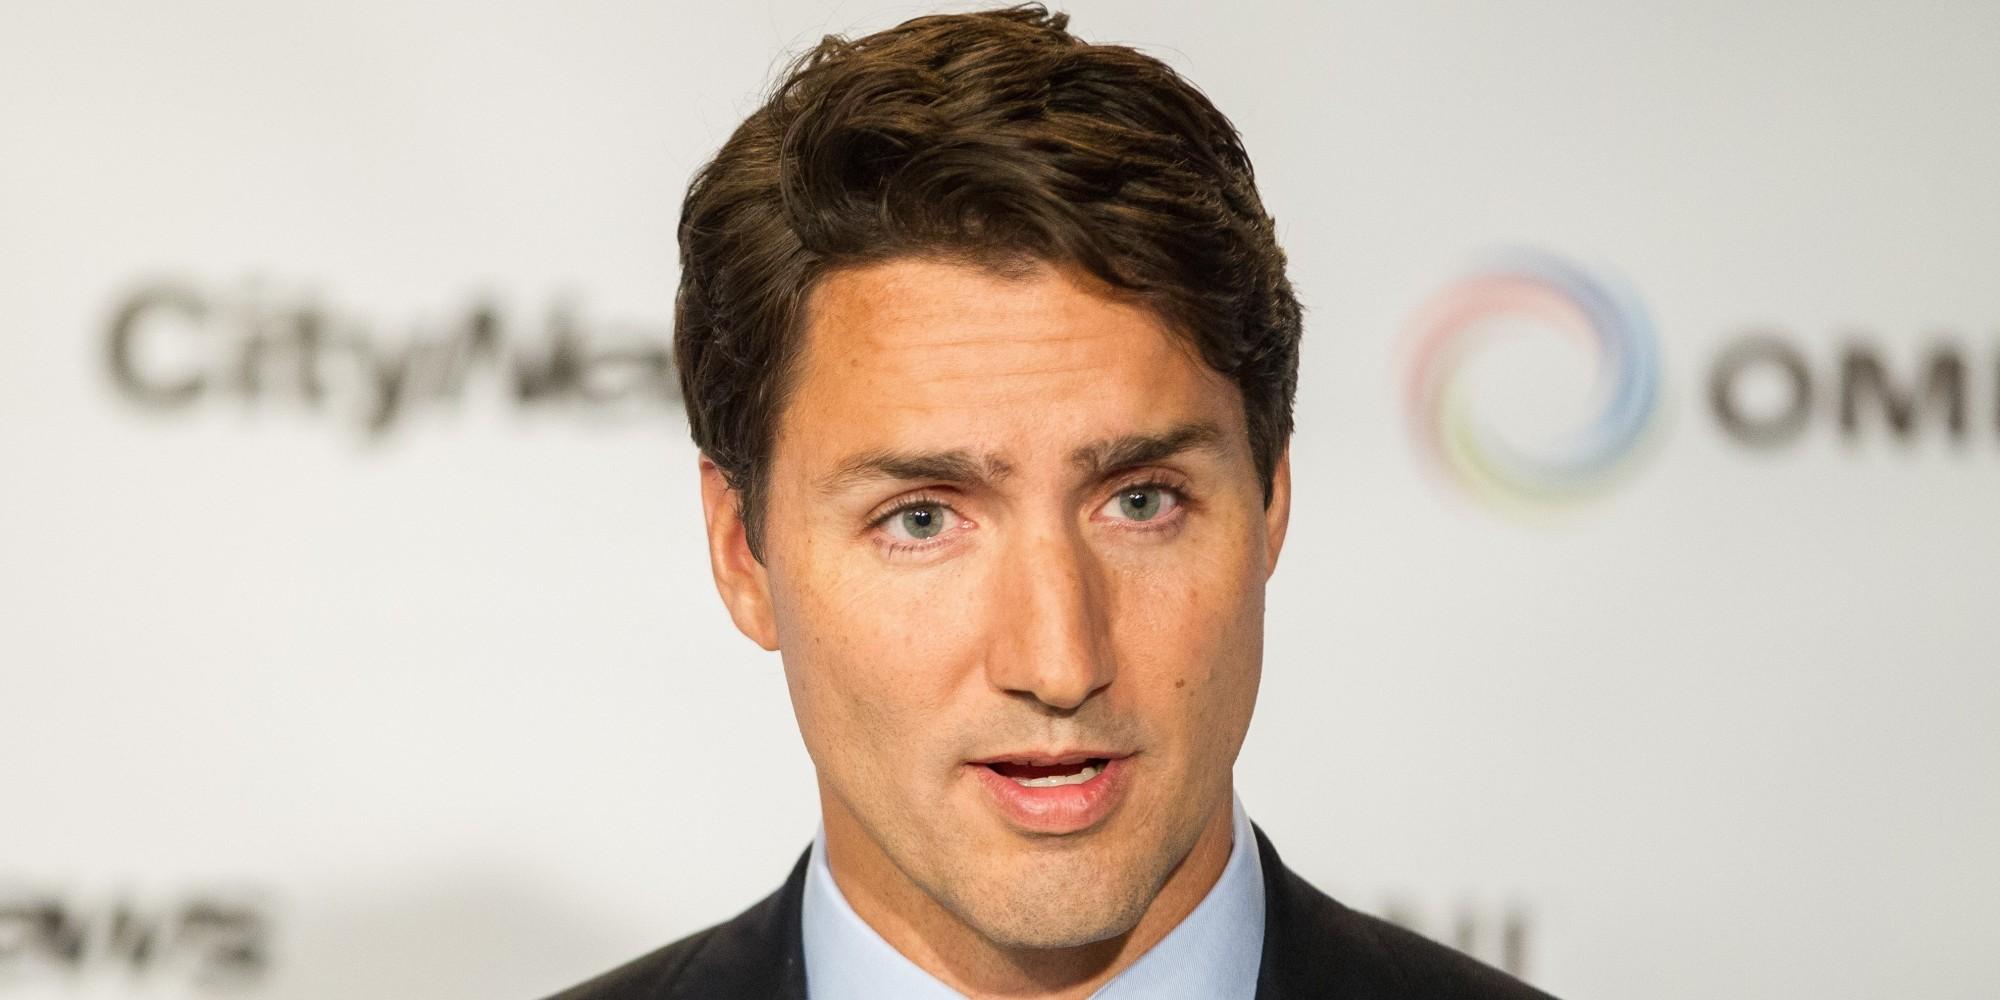 Prime Minister Justin Trudeau | Prime Minister of Canada